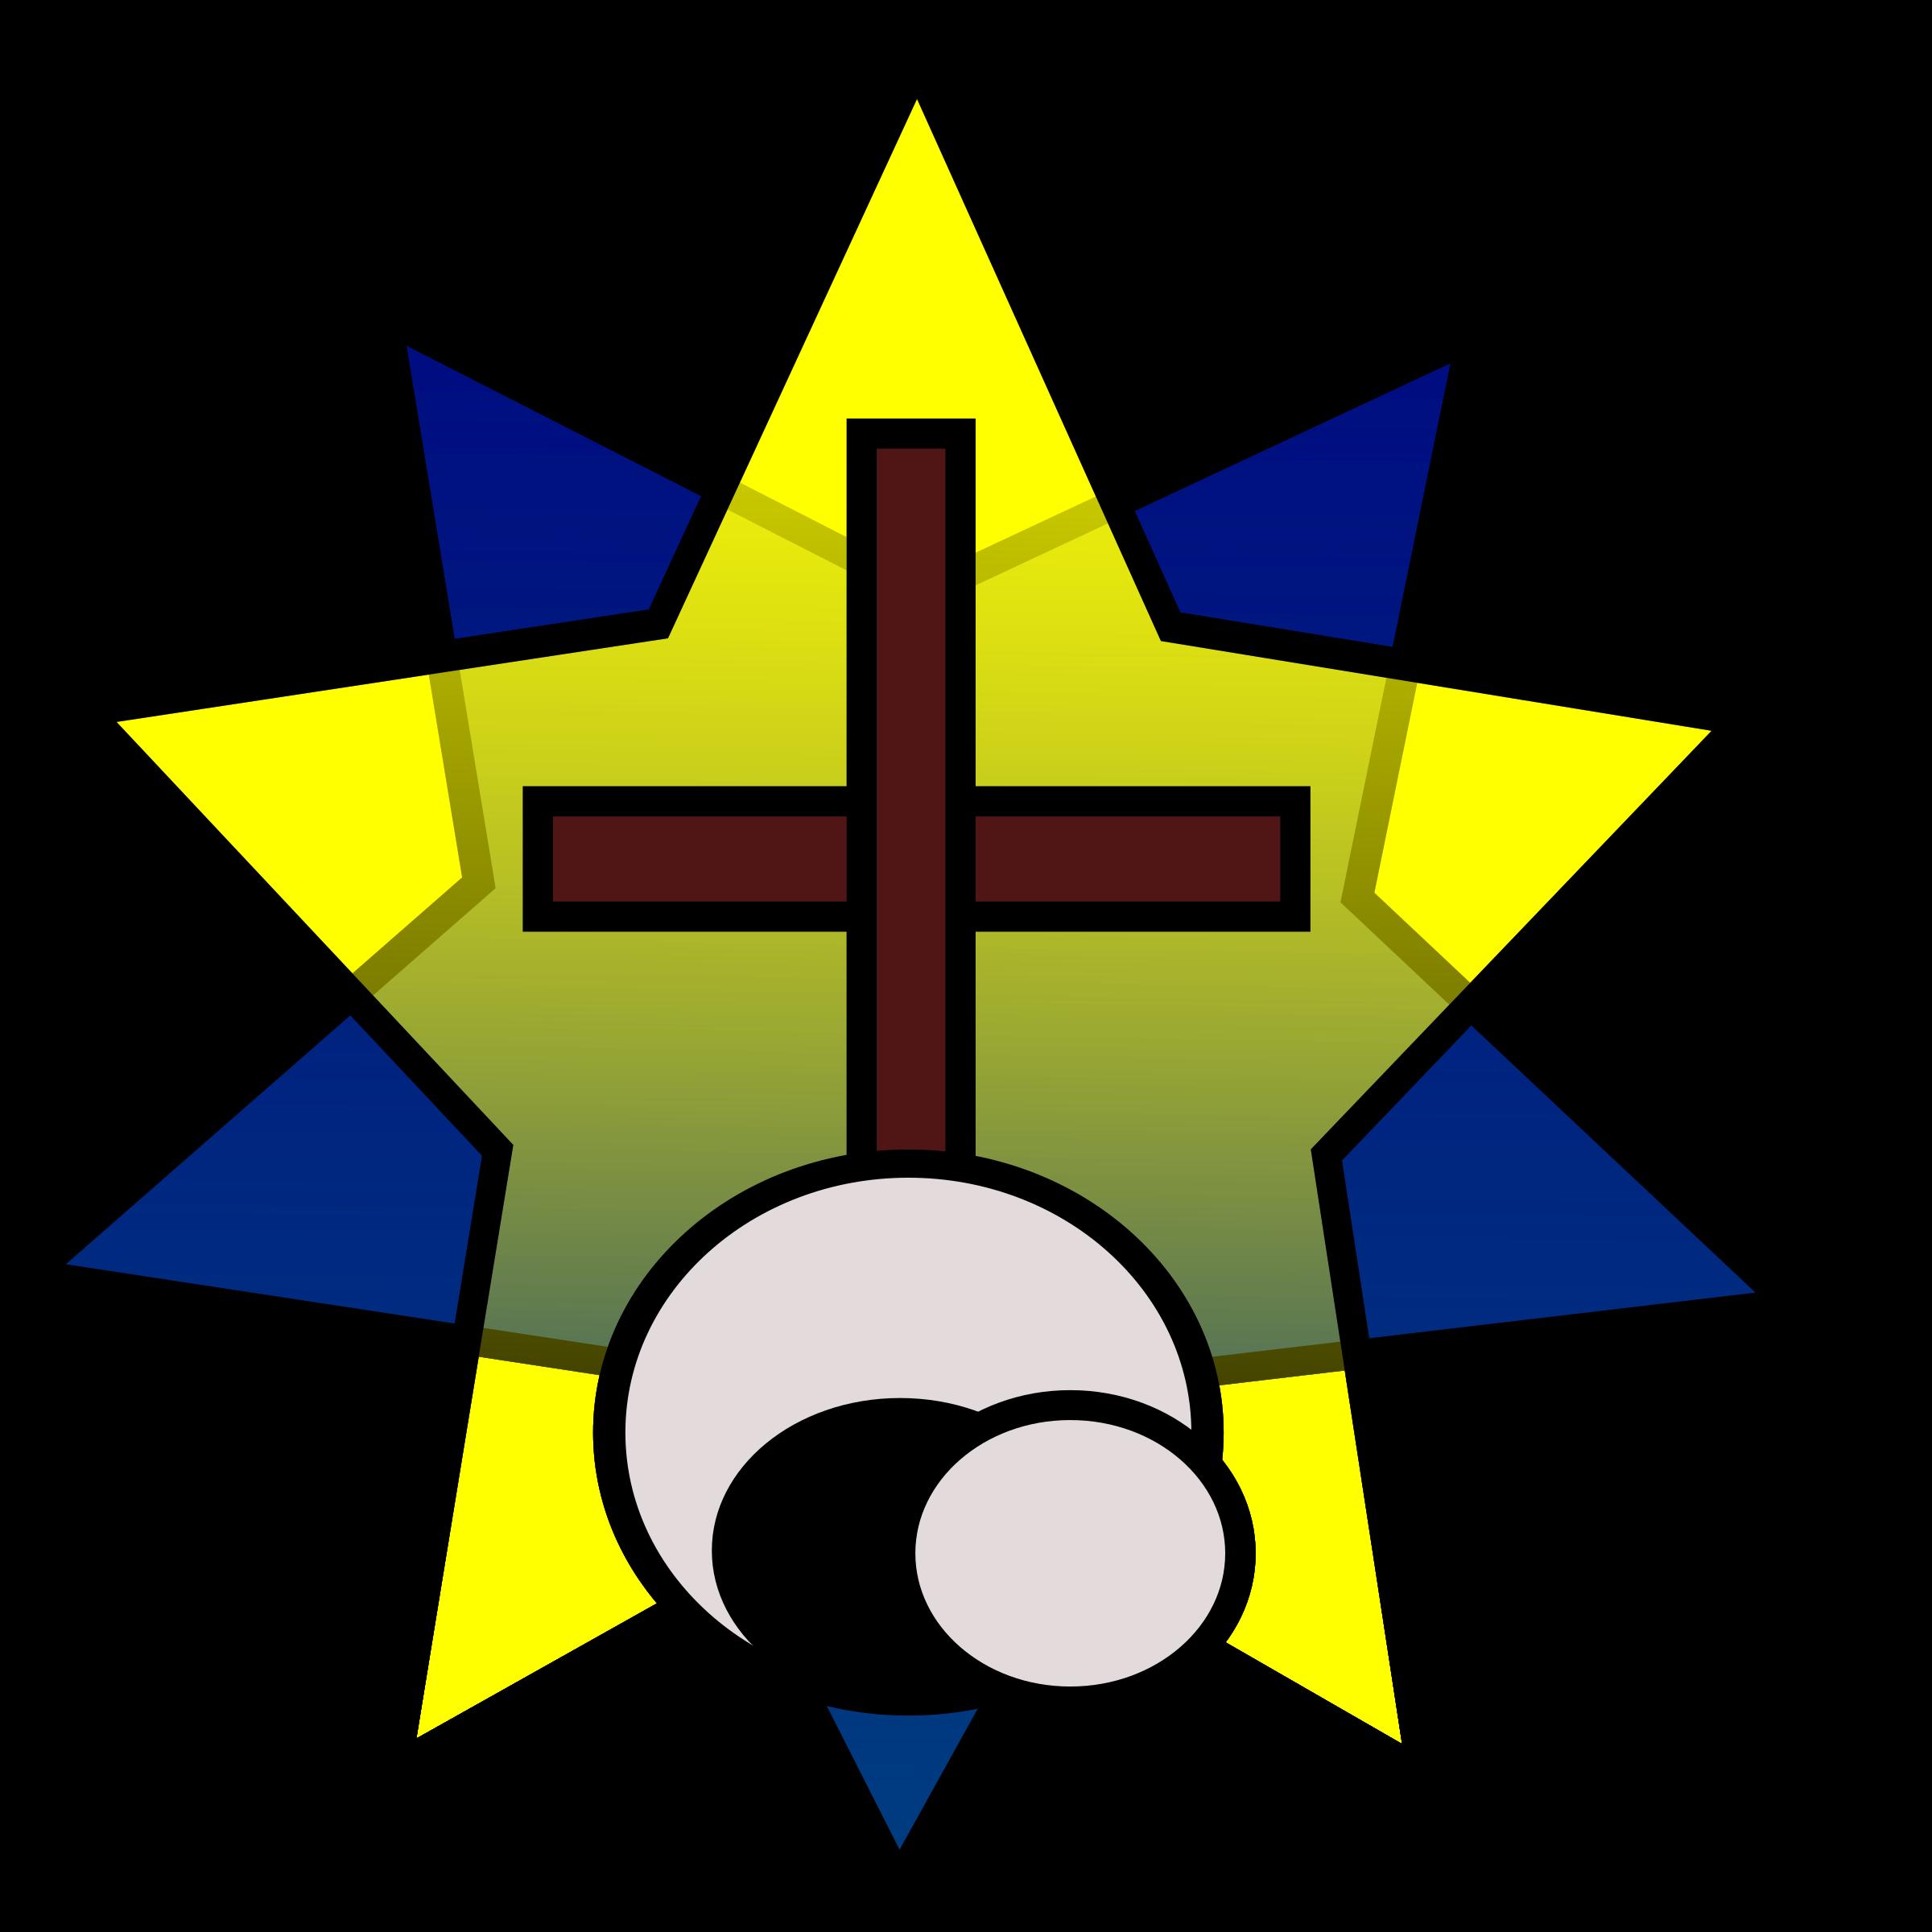 Clipart symbolism star empty. Cross clip art resurrection